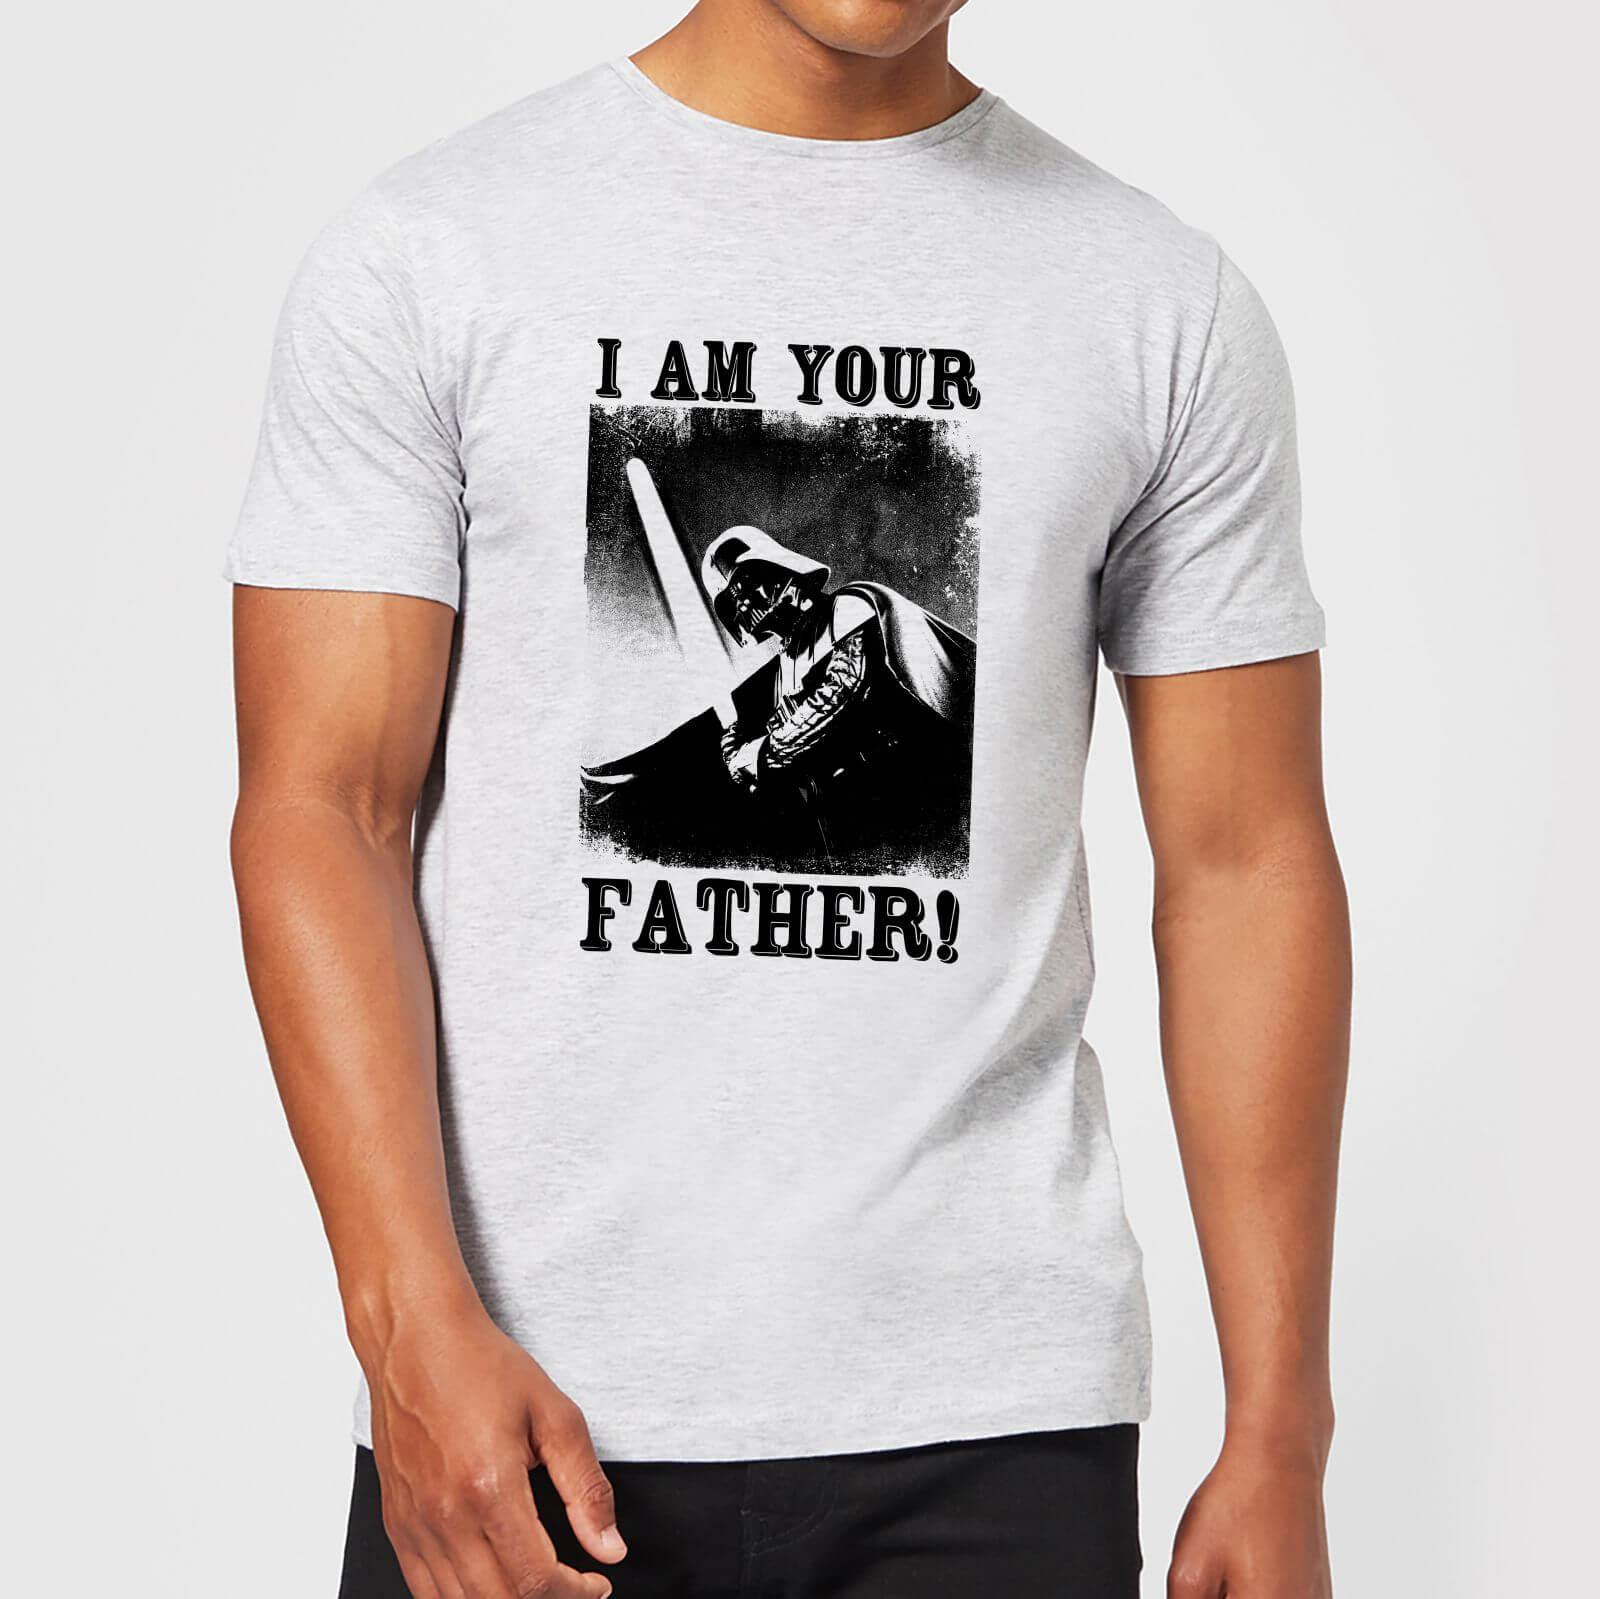 OfferteWeb.click 52-t-shirt-star-wars-darth-vader-i-am-your-father-lightsaber